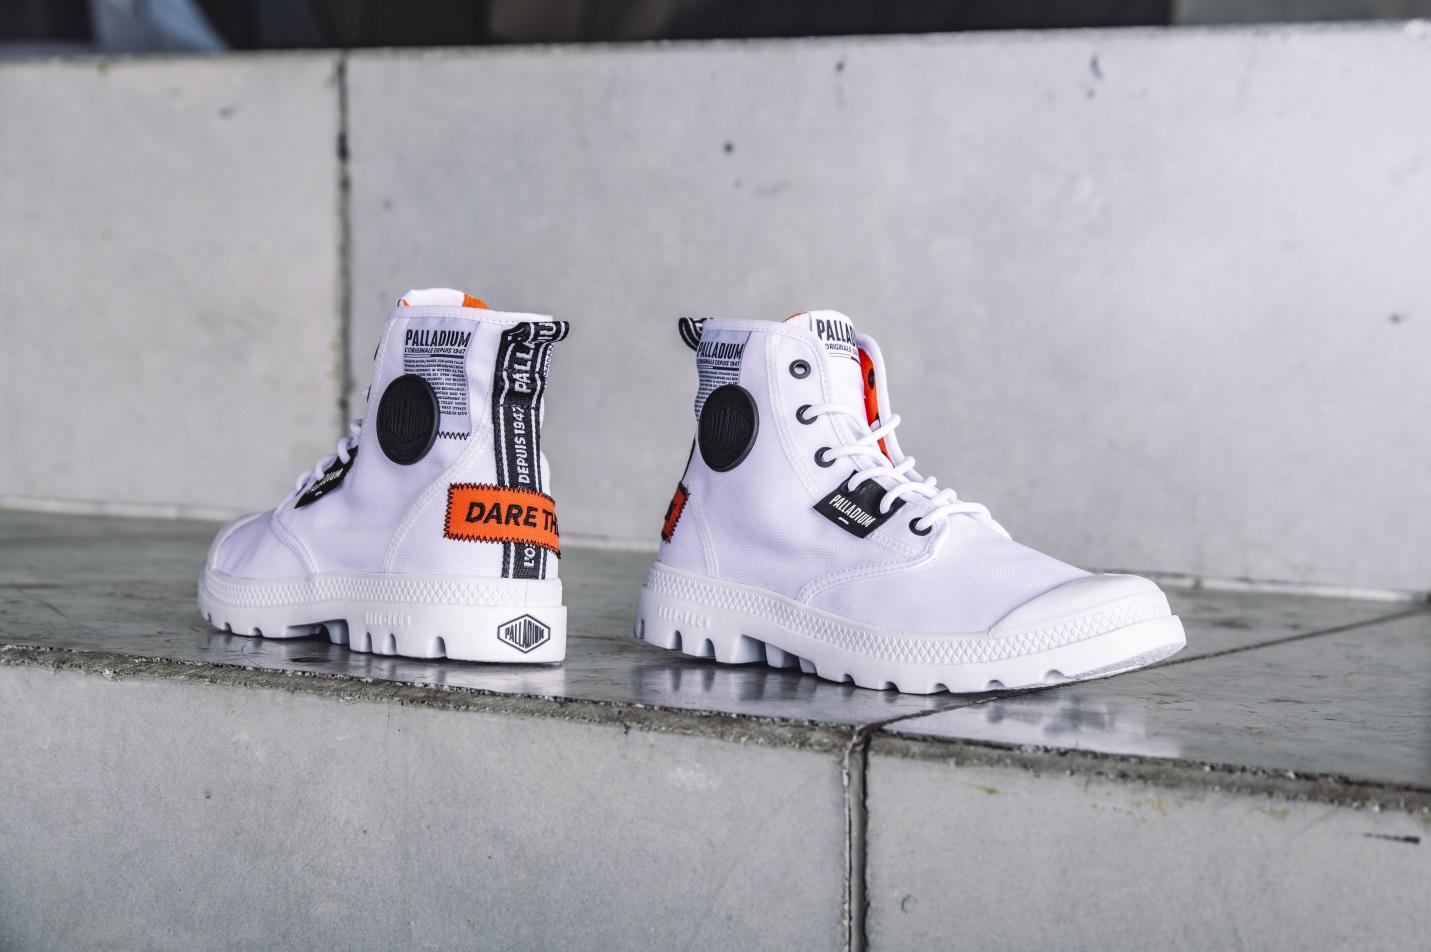 BST giày Overlab của Palladium